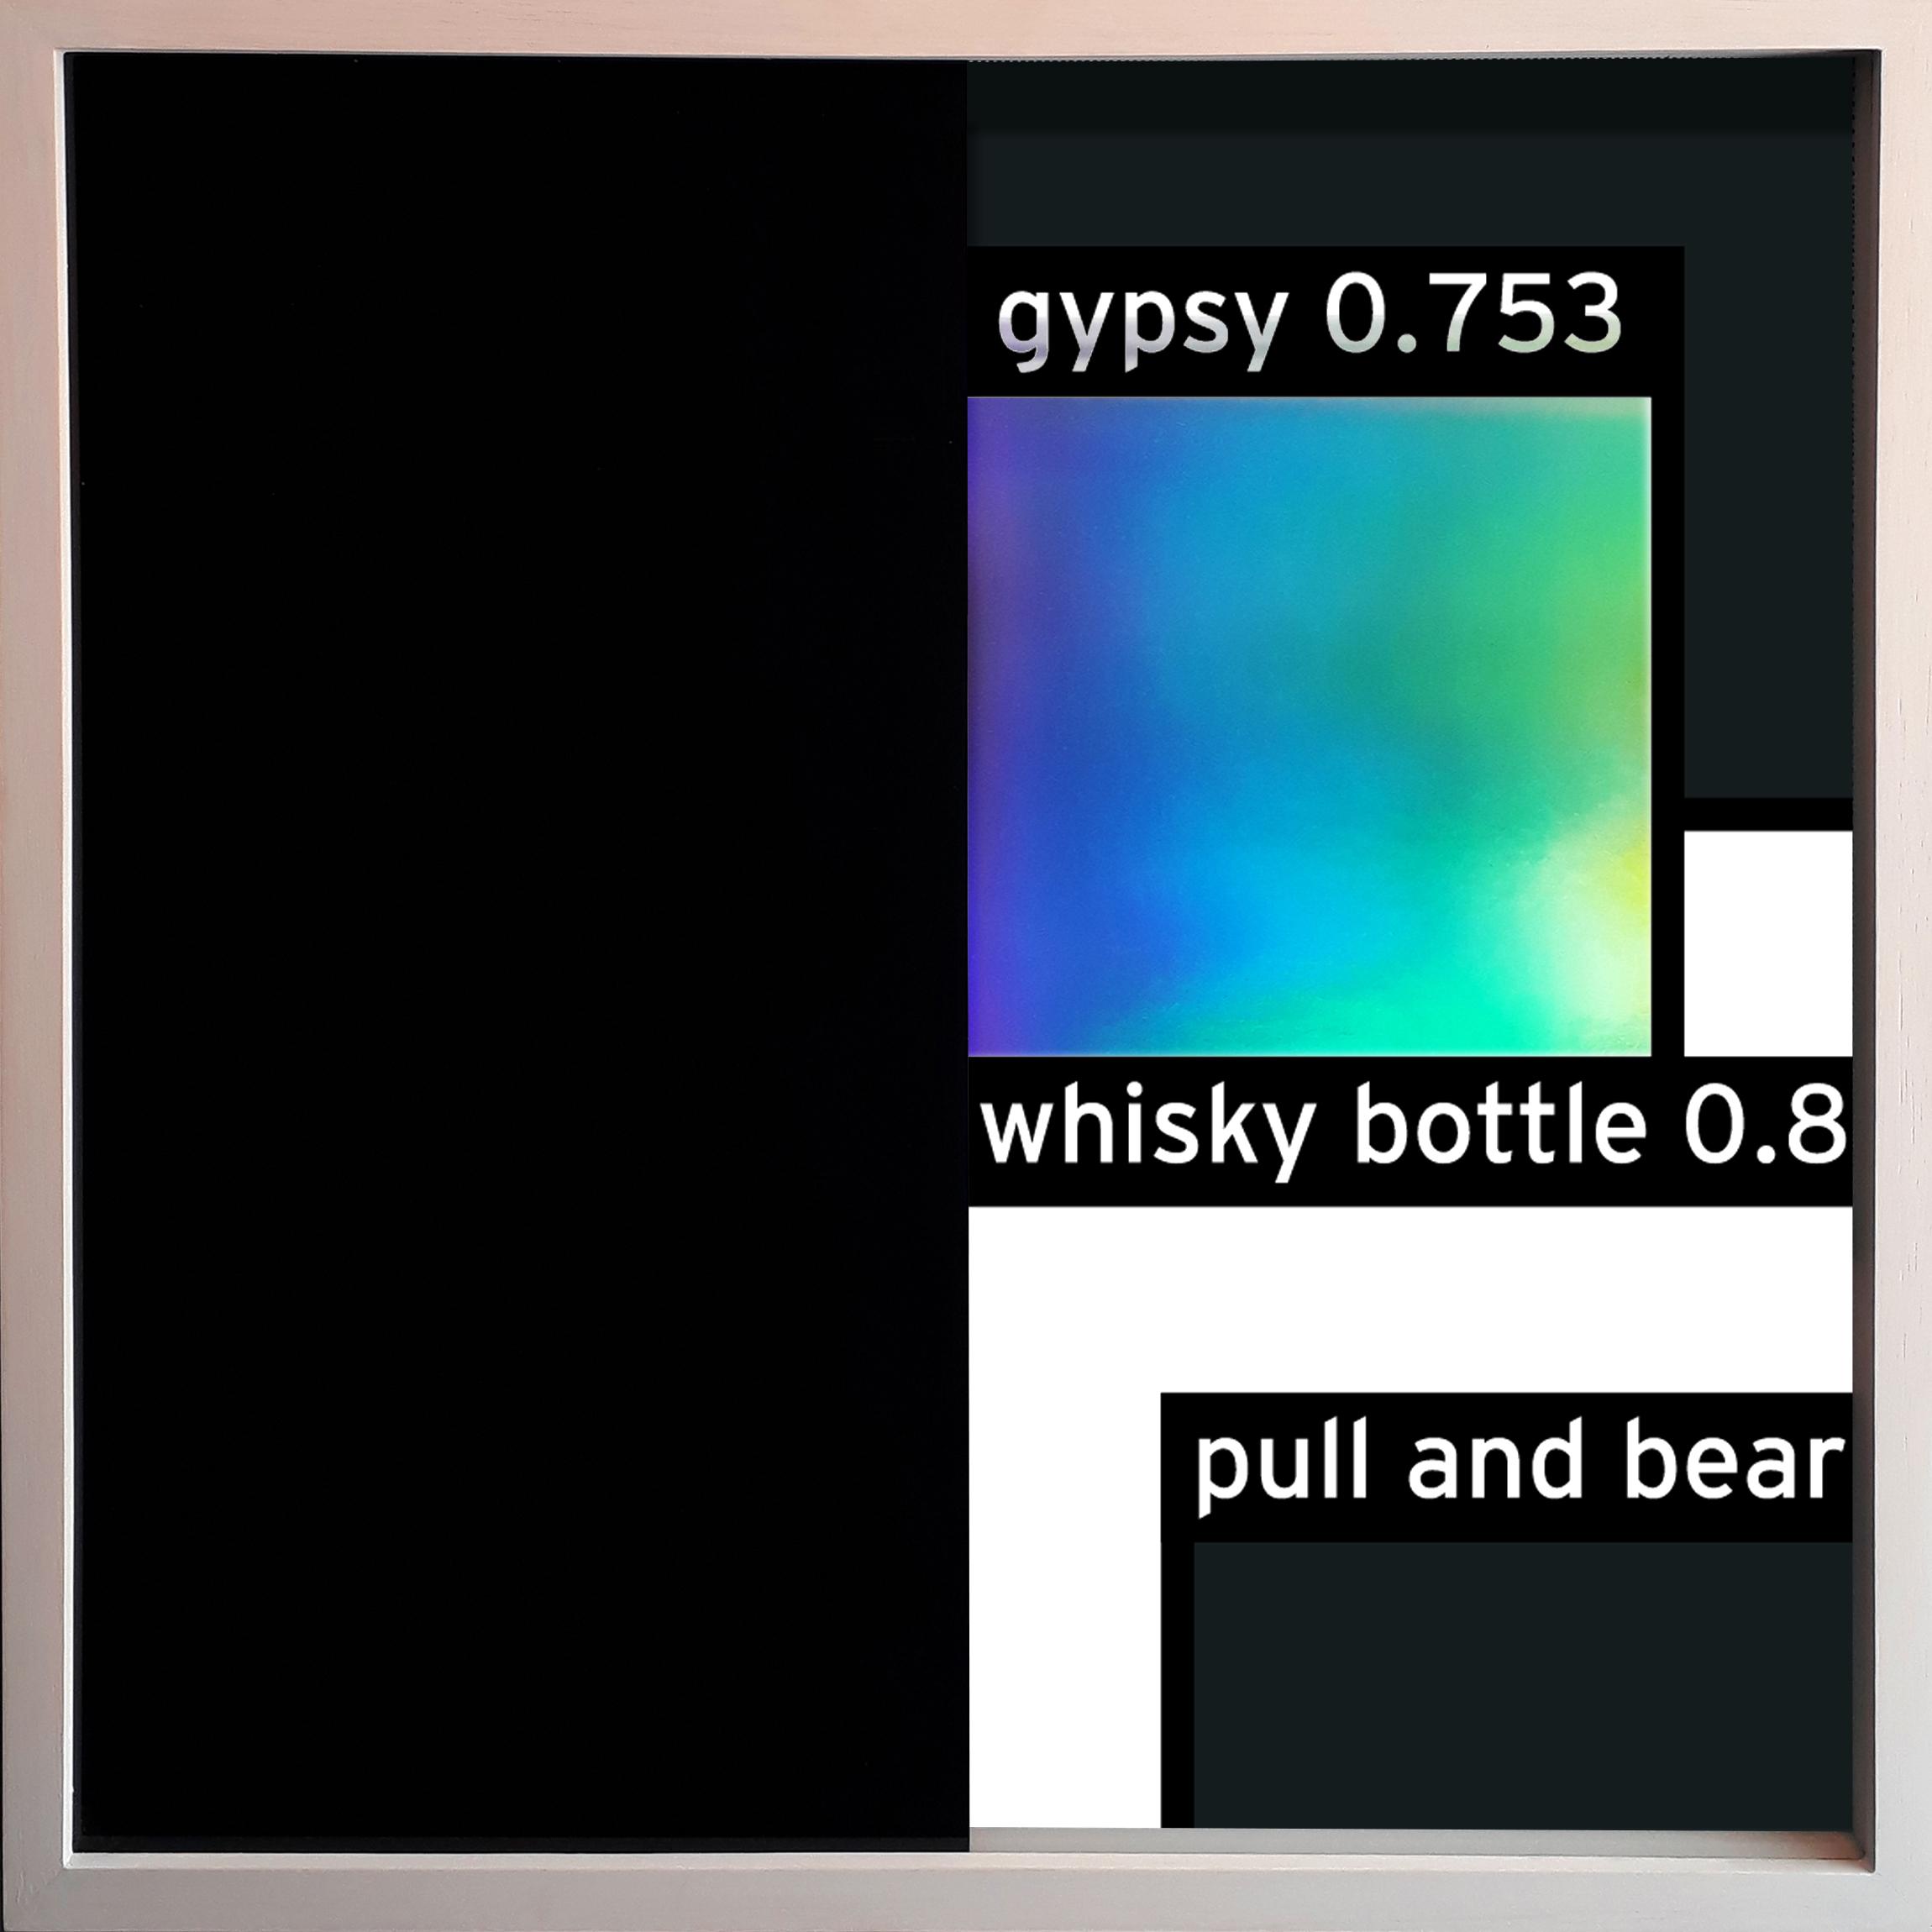 YOUNG GYPSY 0.753